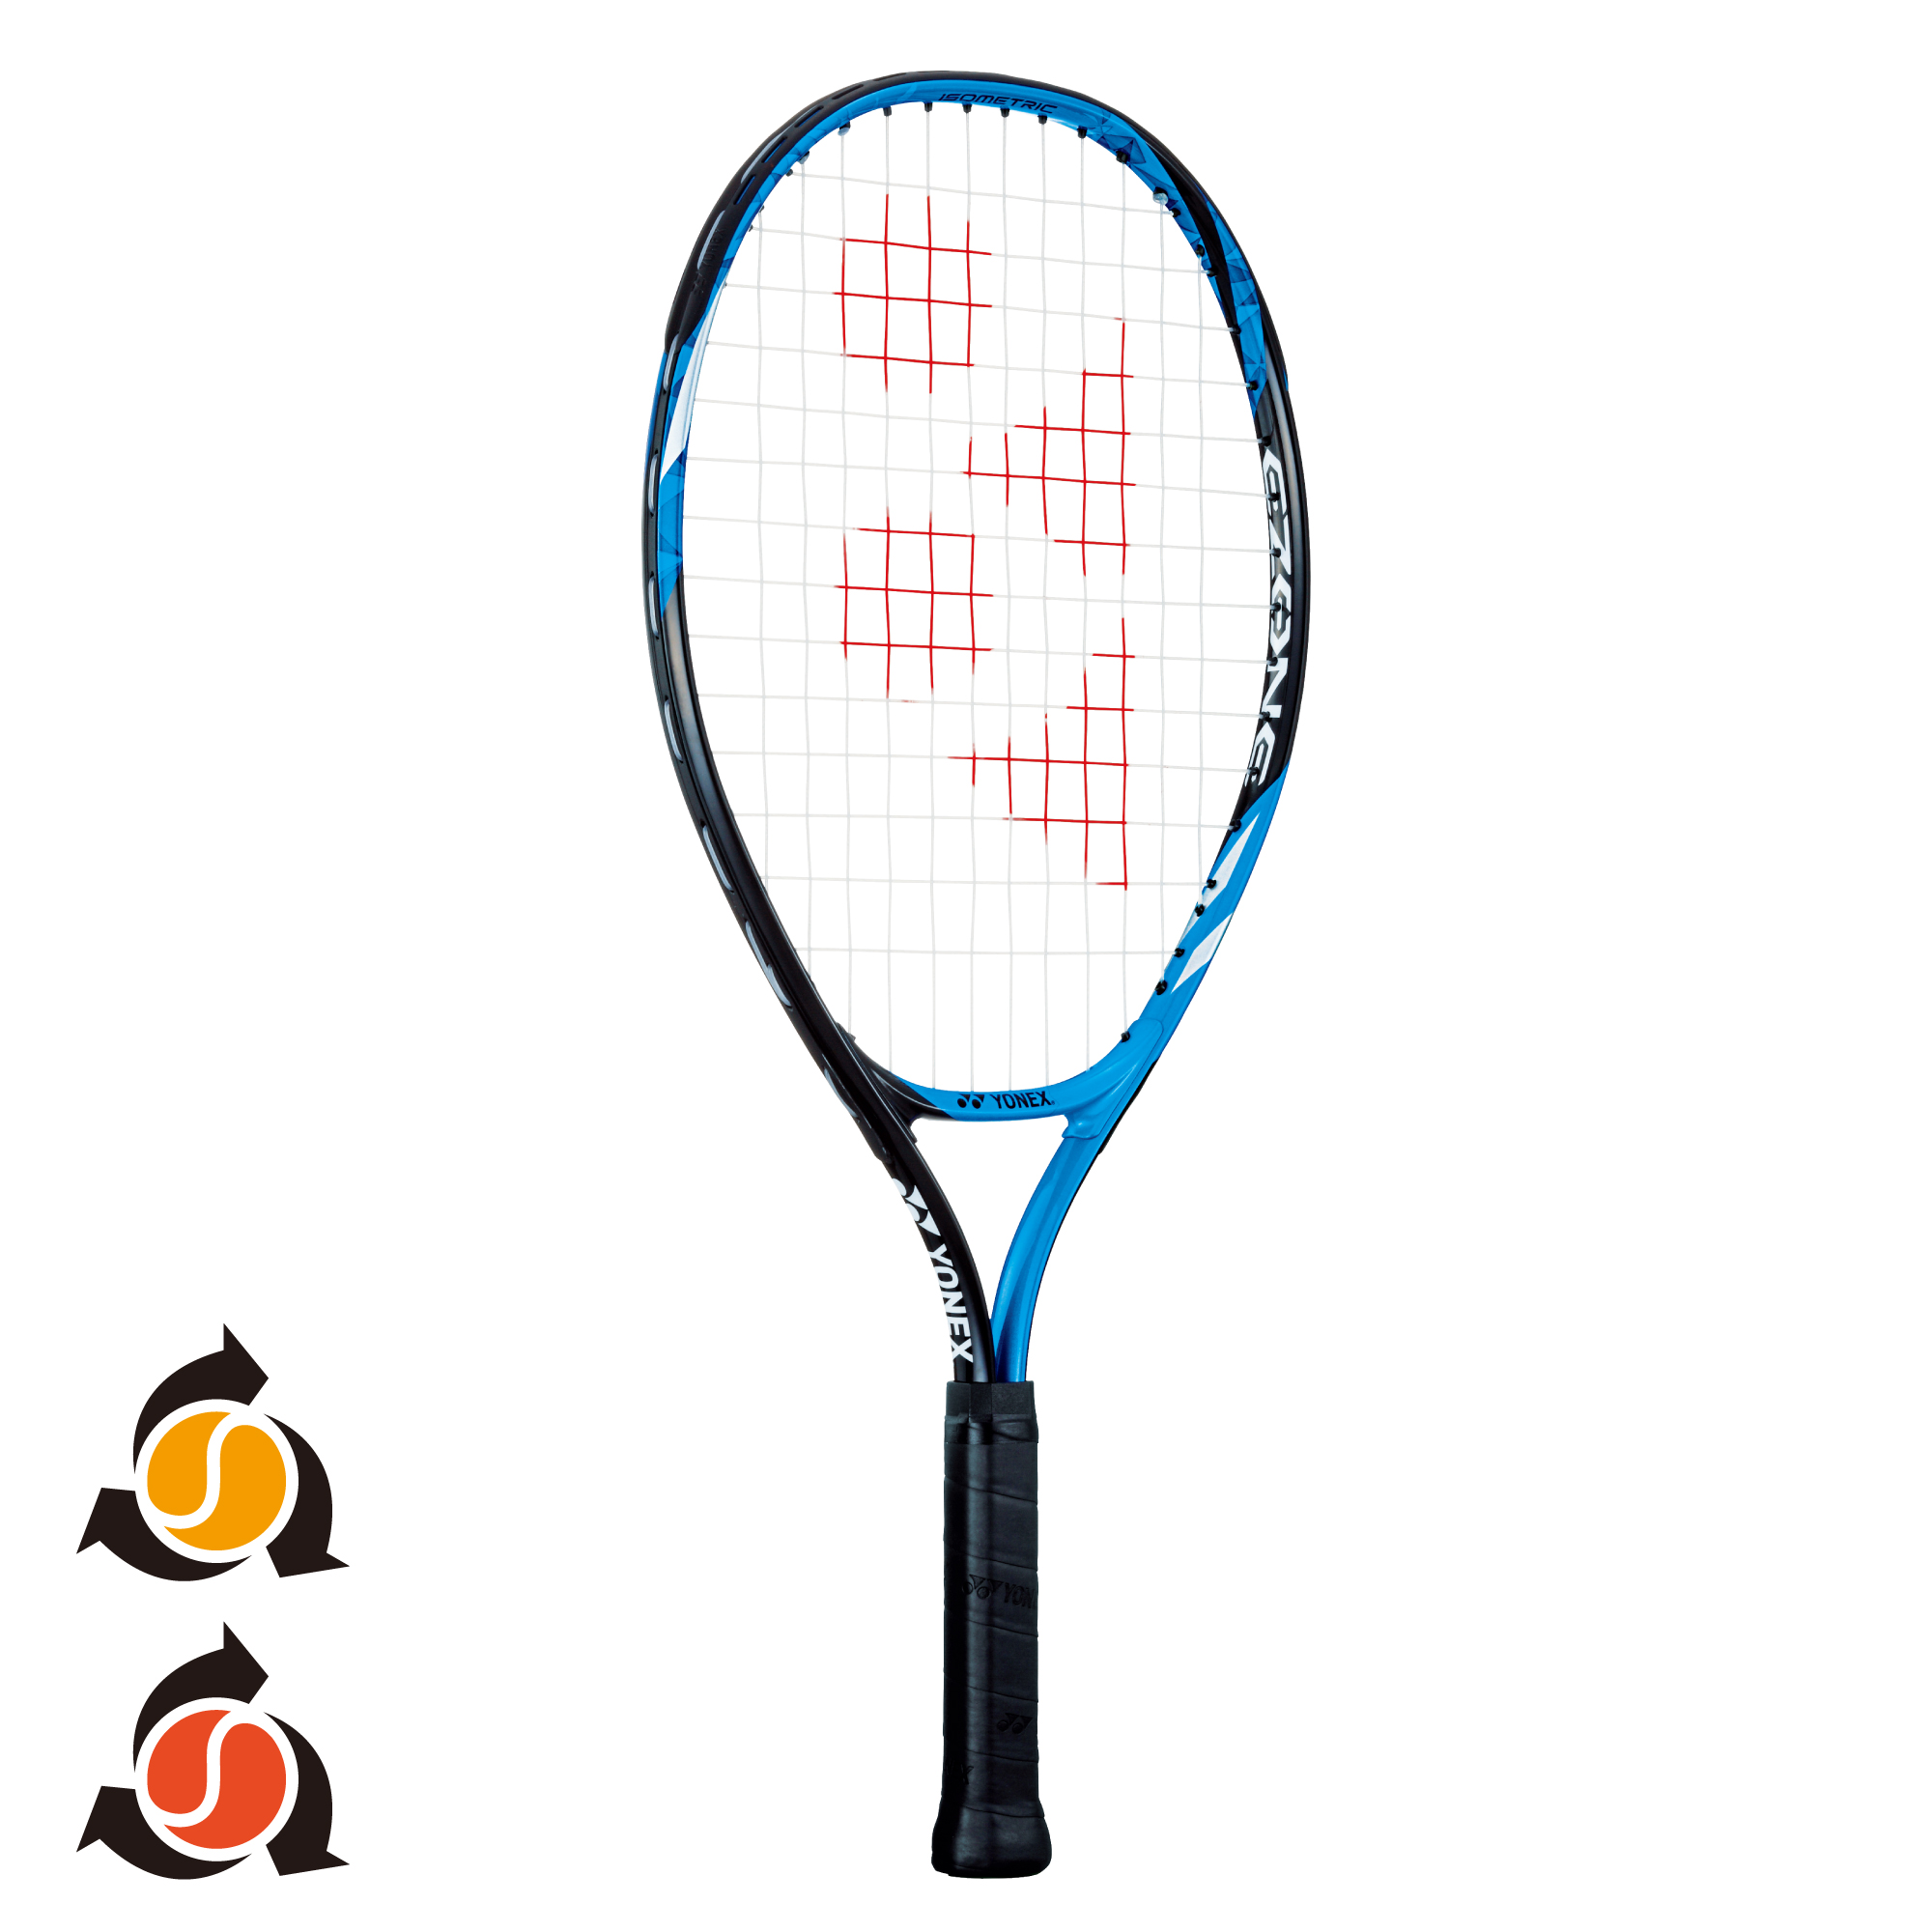 263947b2d4d231 EZONE Junior23 | RACQUETS ラケット | YONEX TENNIS ヨネックステニス